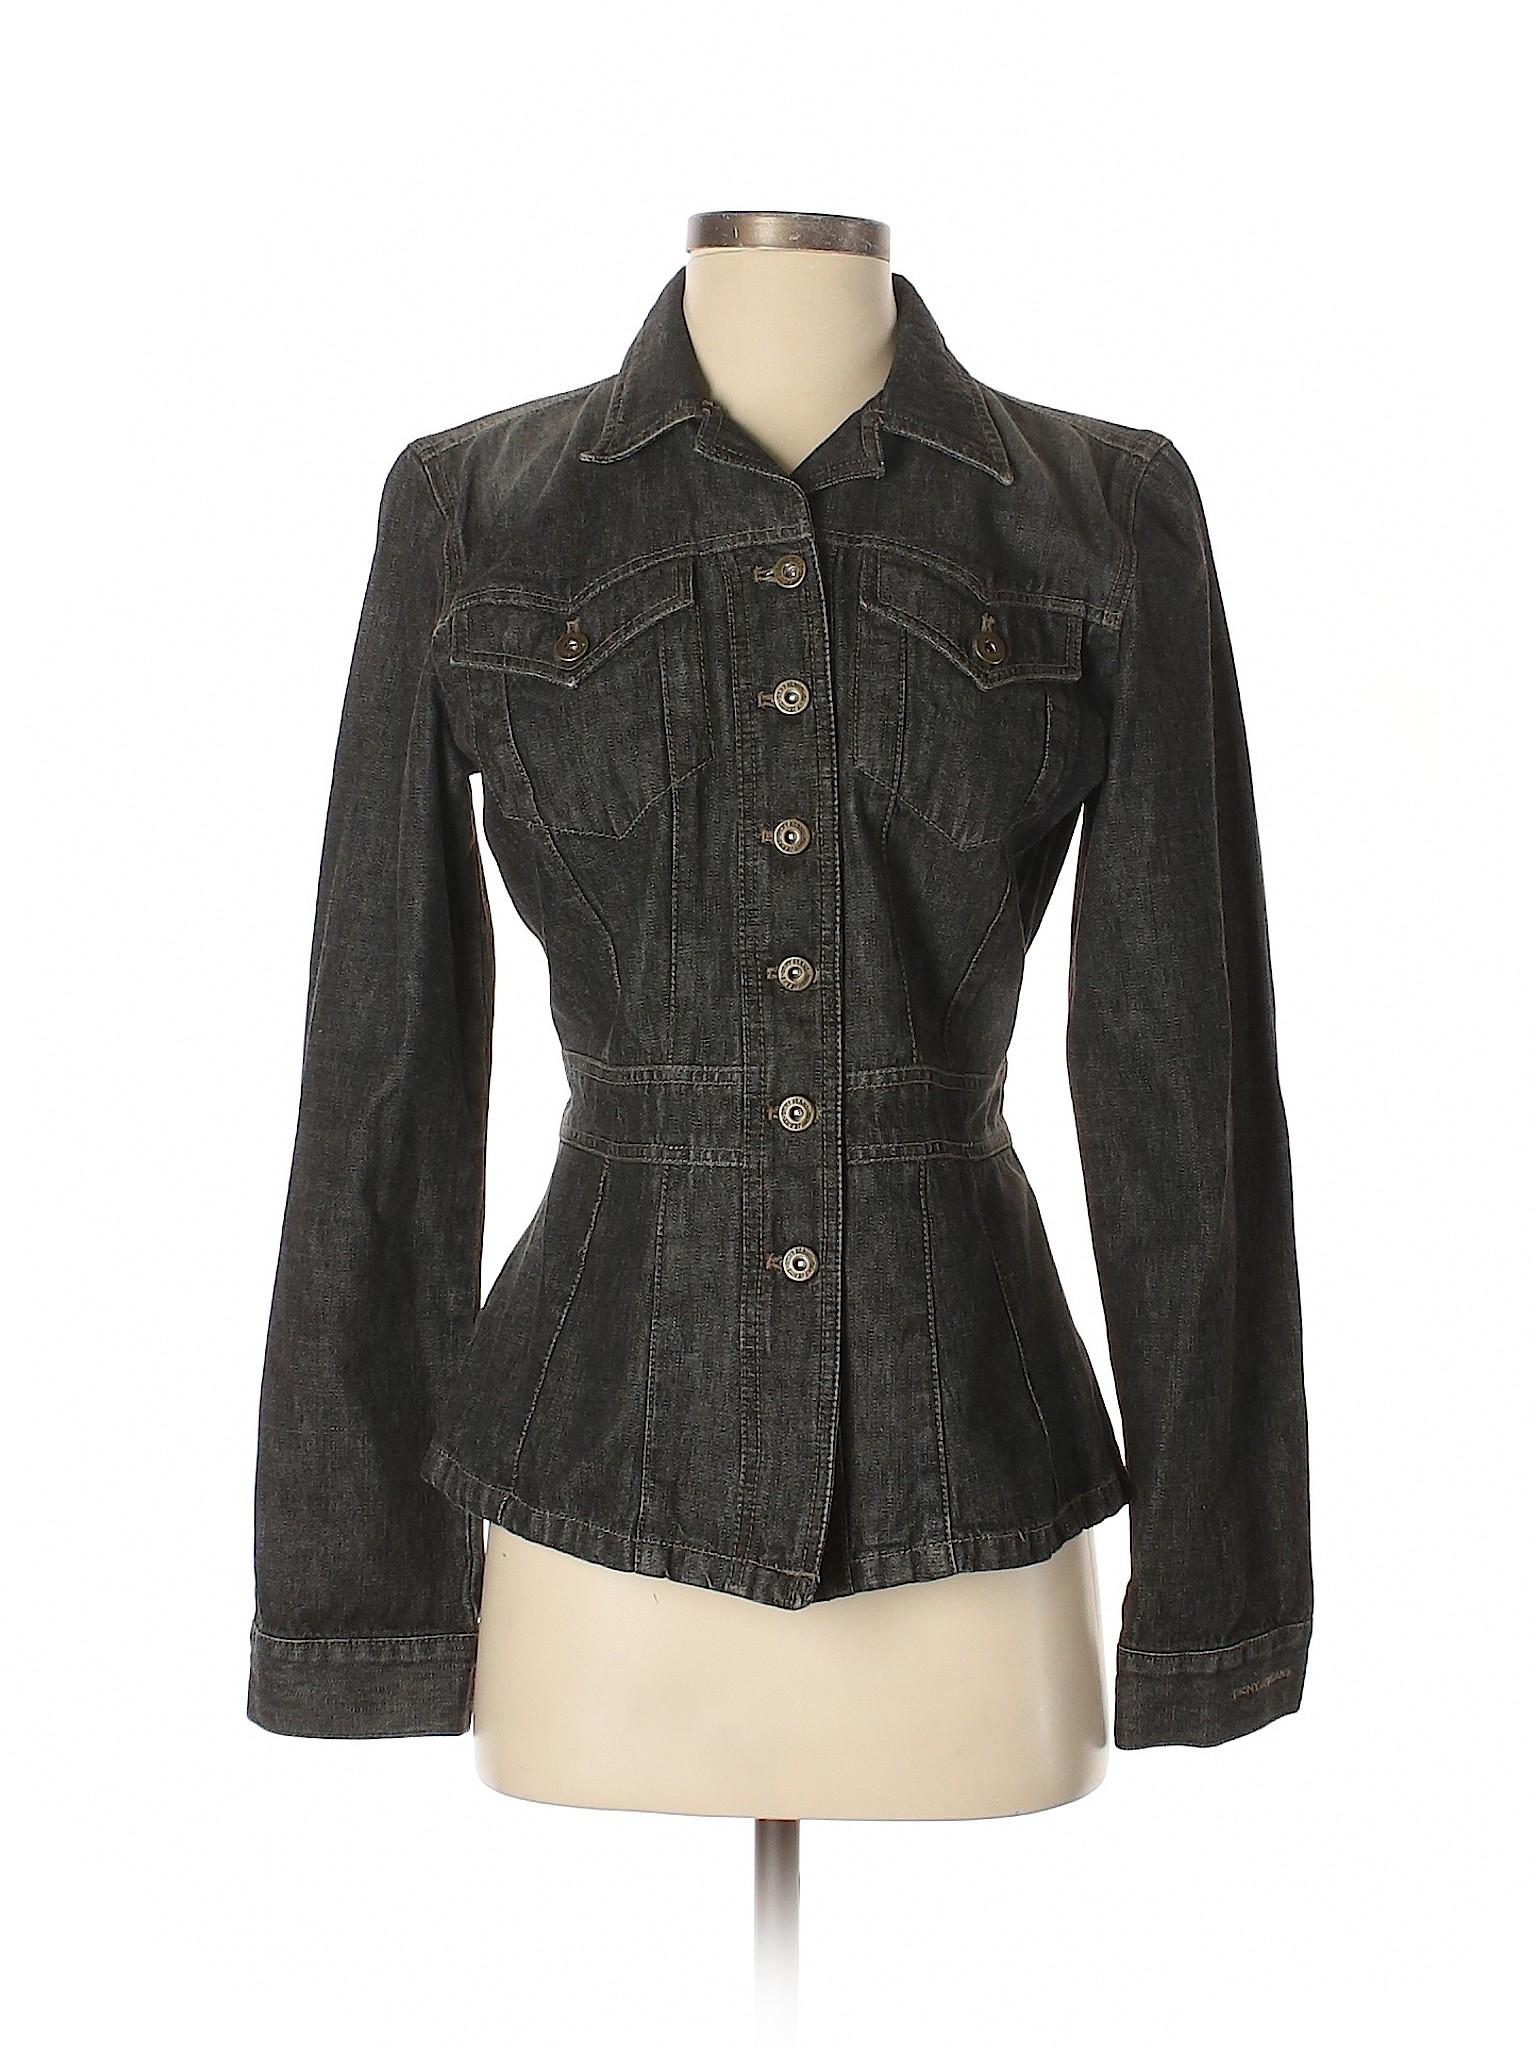 DKNY Jeans 100% Cotton Solid Black Denim Jacket Size M 68